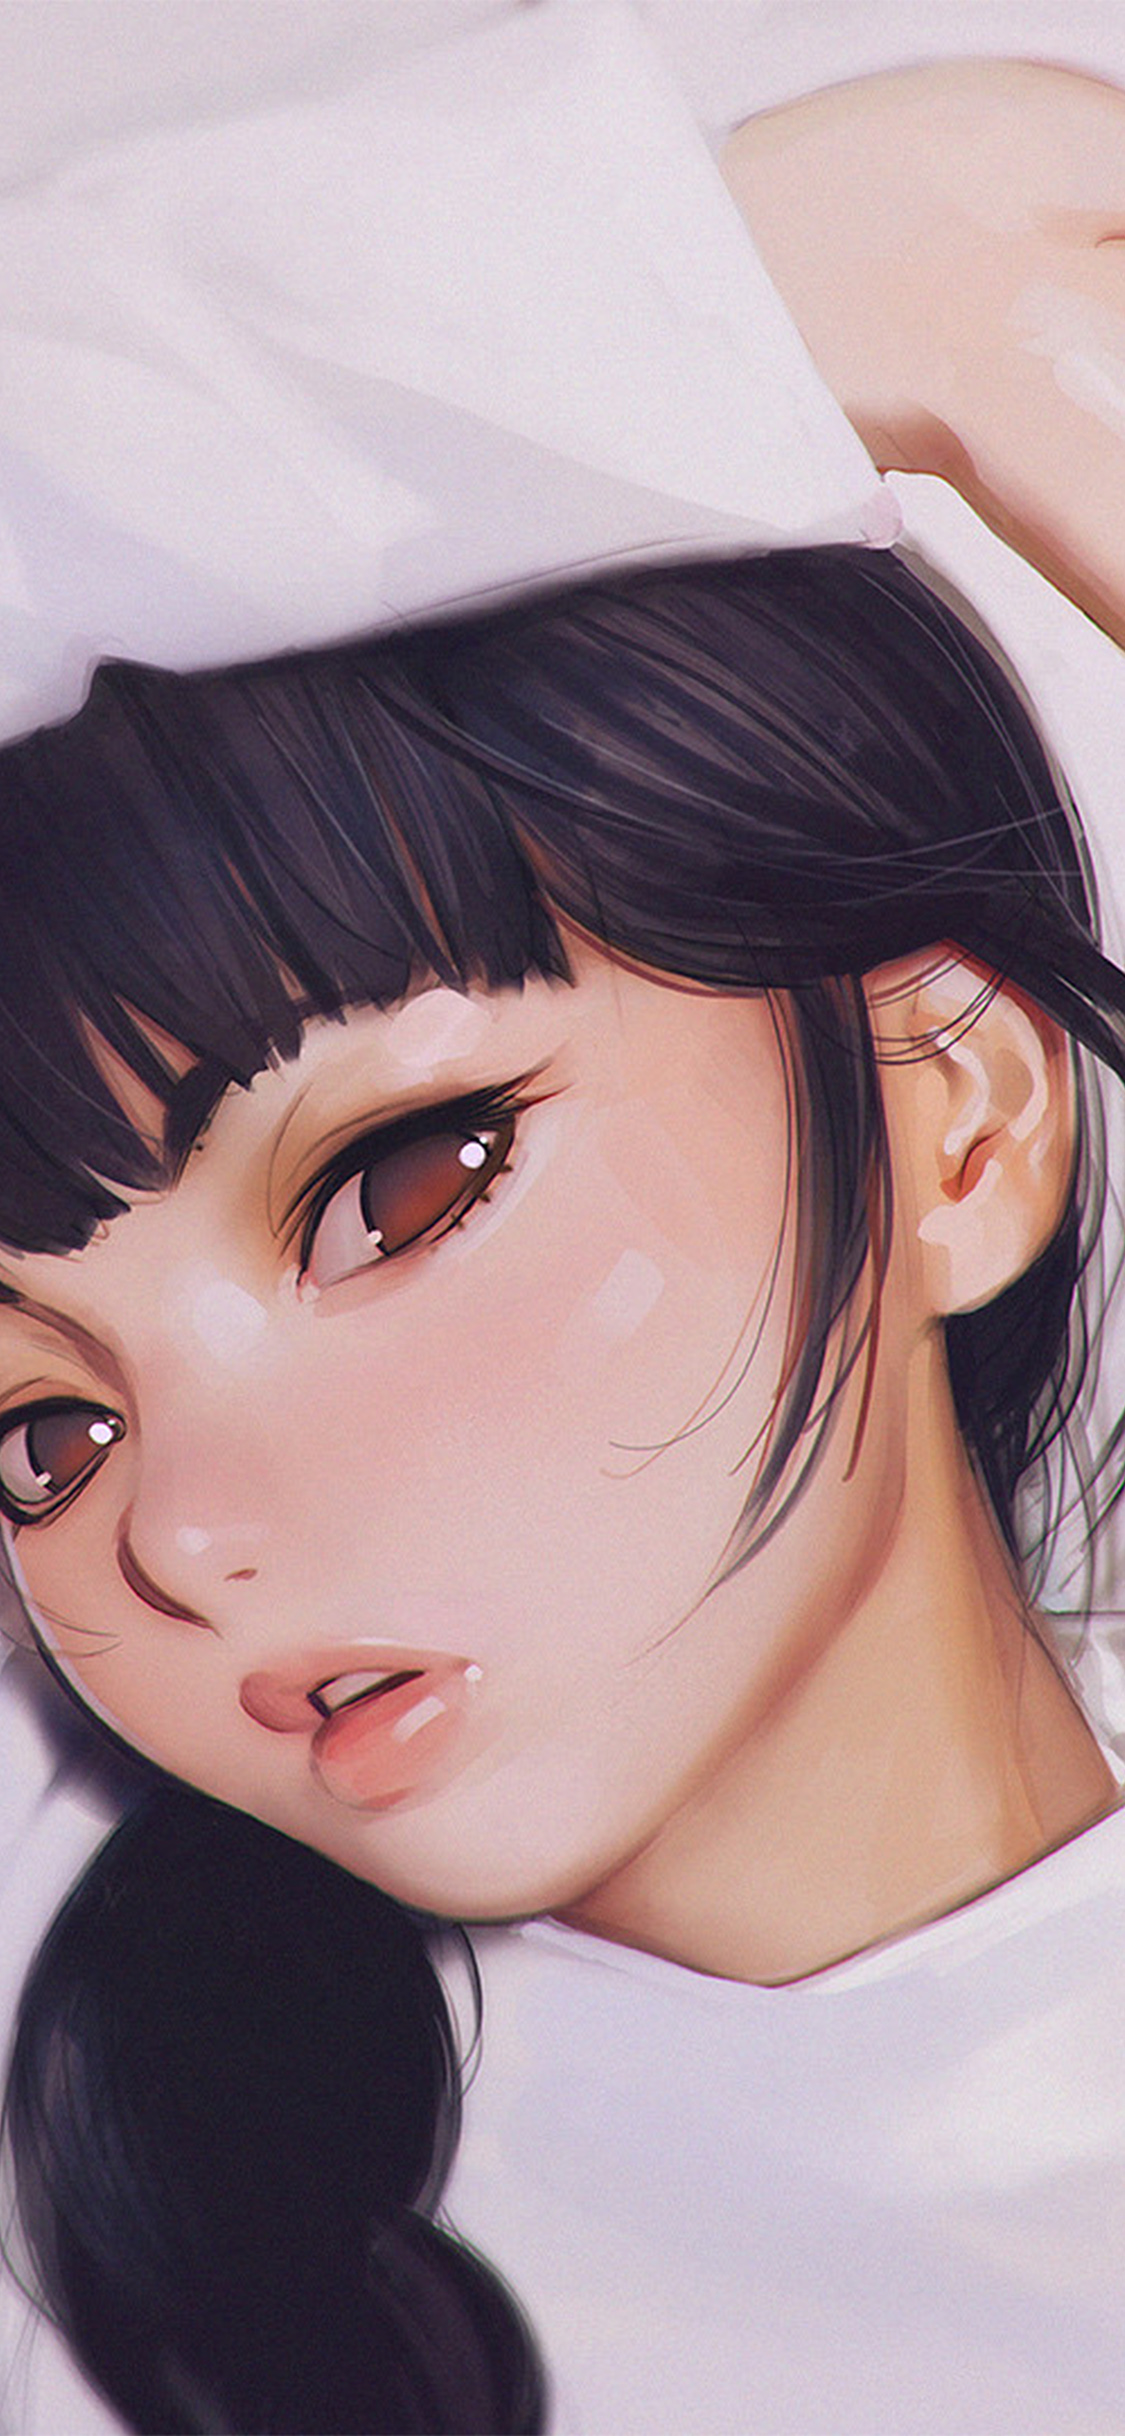 iPhoneXpapers.com-Apple-iPhone-wallpaper-aw24-ilya-kuvshinov-anime-girl-shy-cute-illustration-art